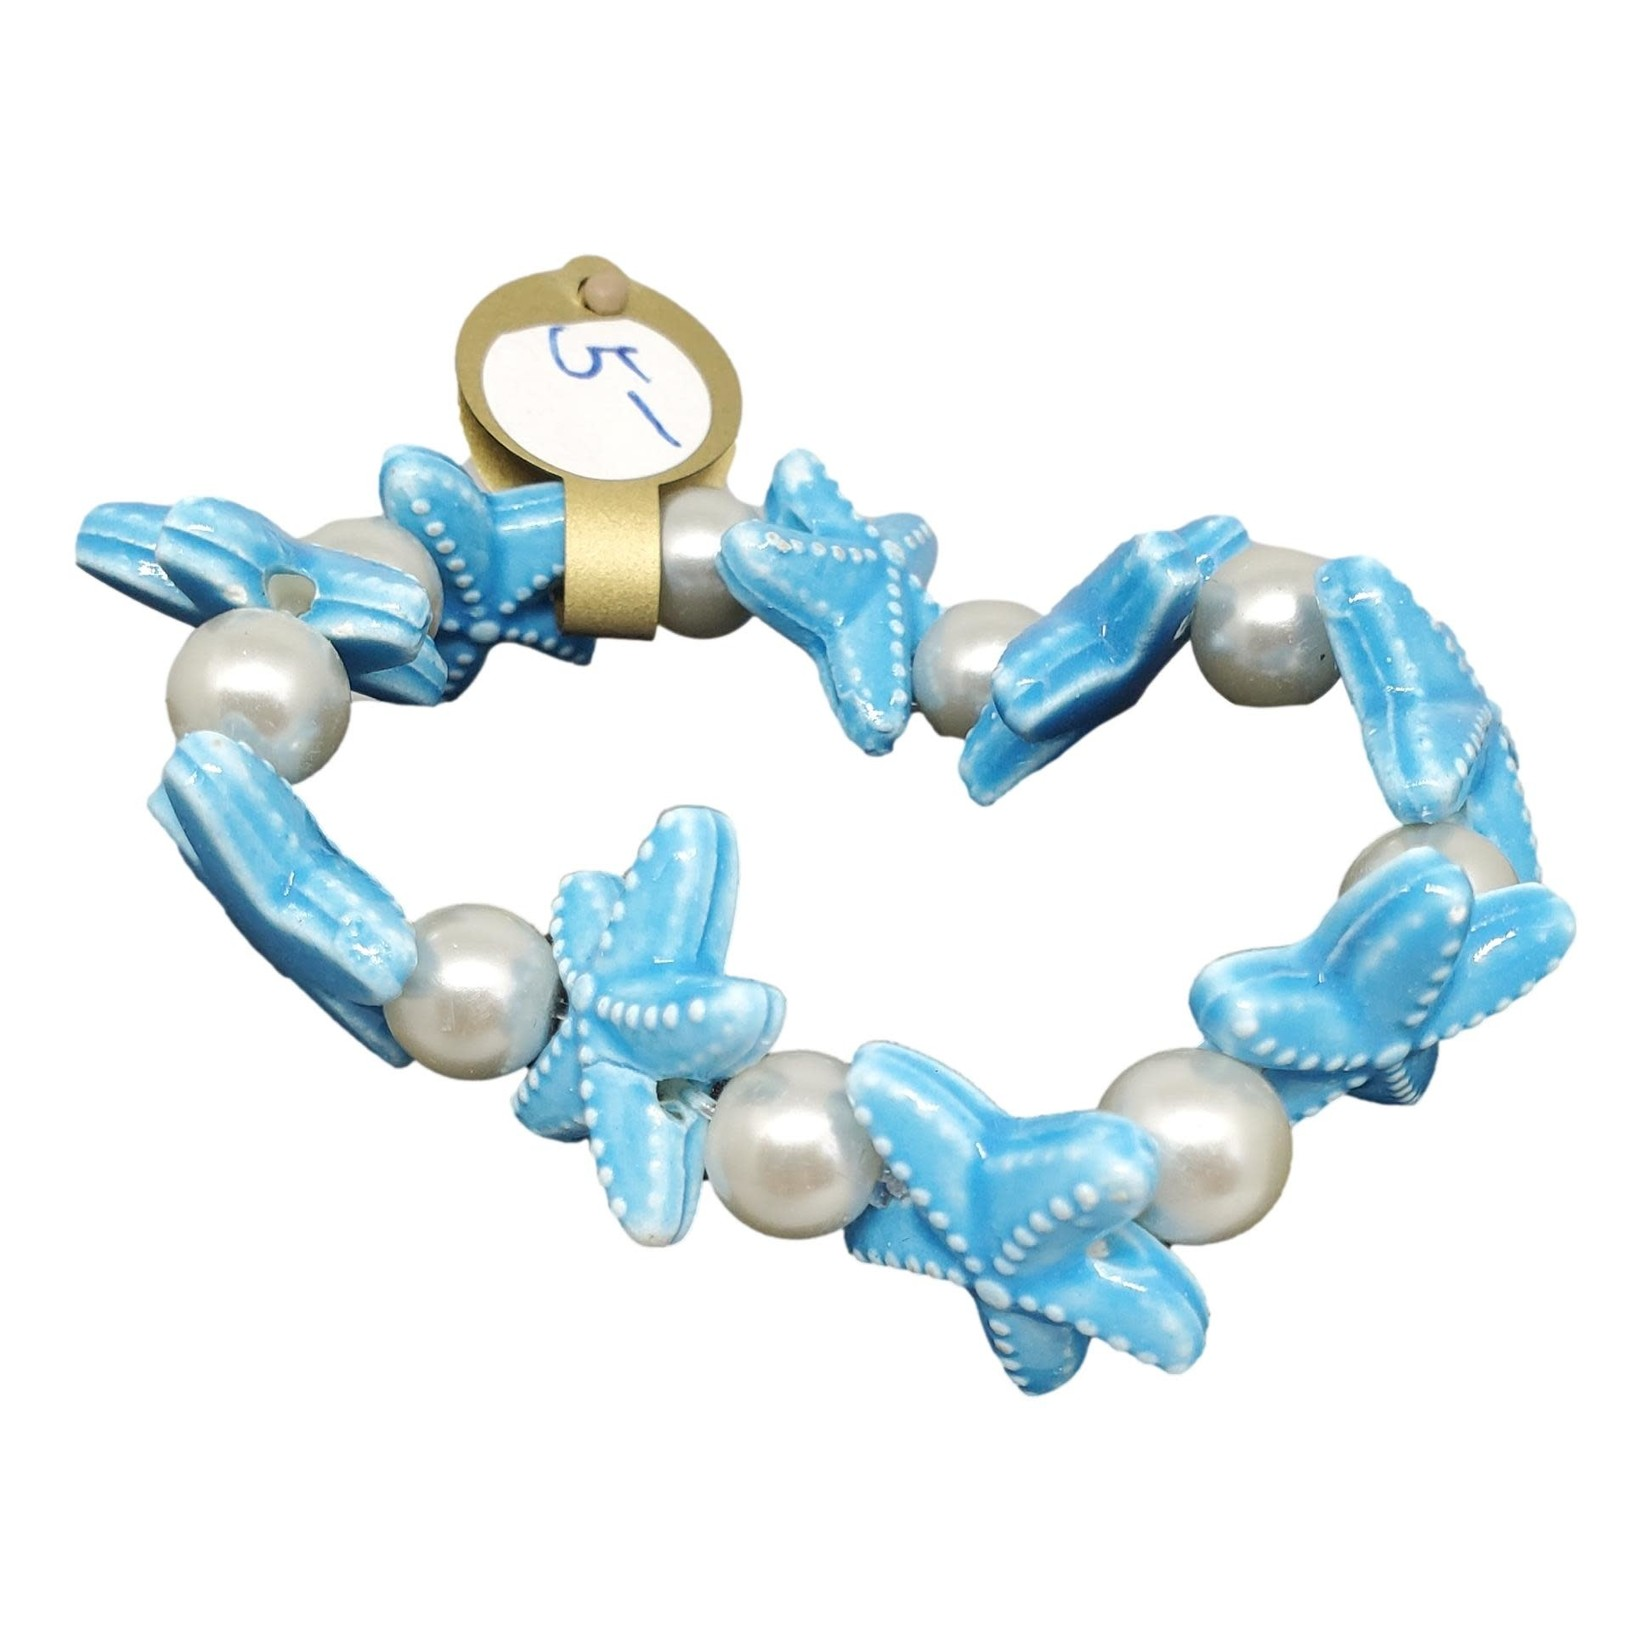 Jewellery by Deborah Young-Groves Pearls & Blue Starfish Bracelet